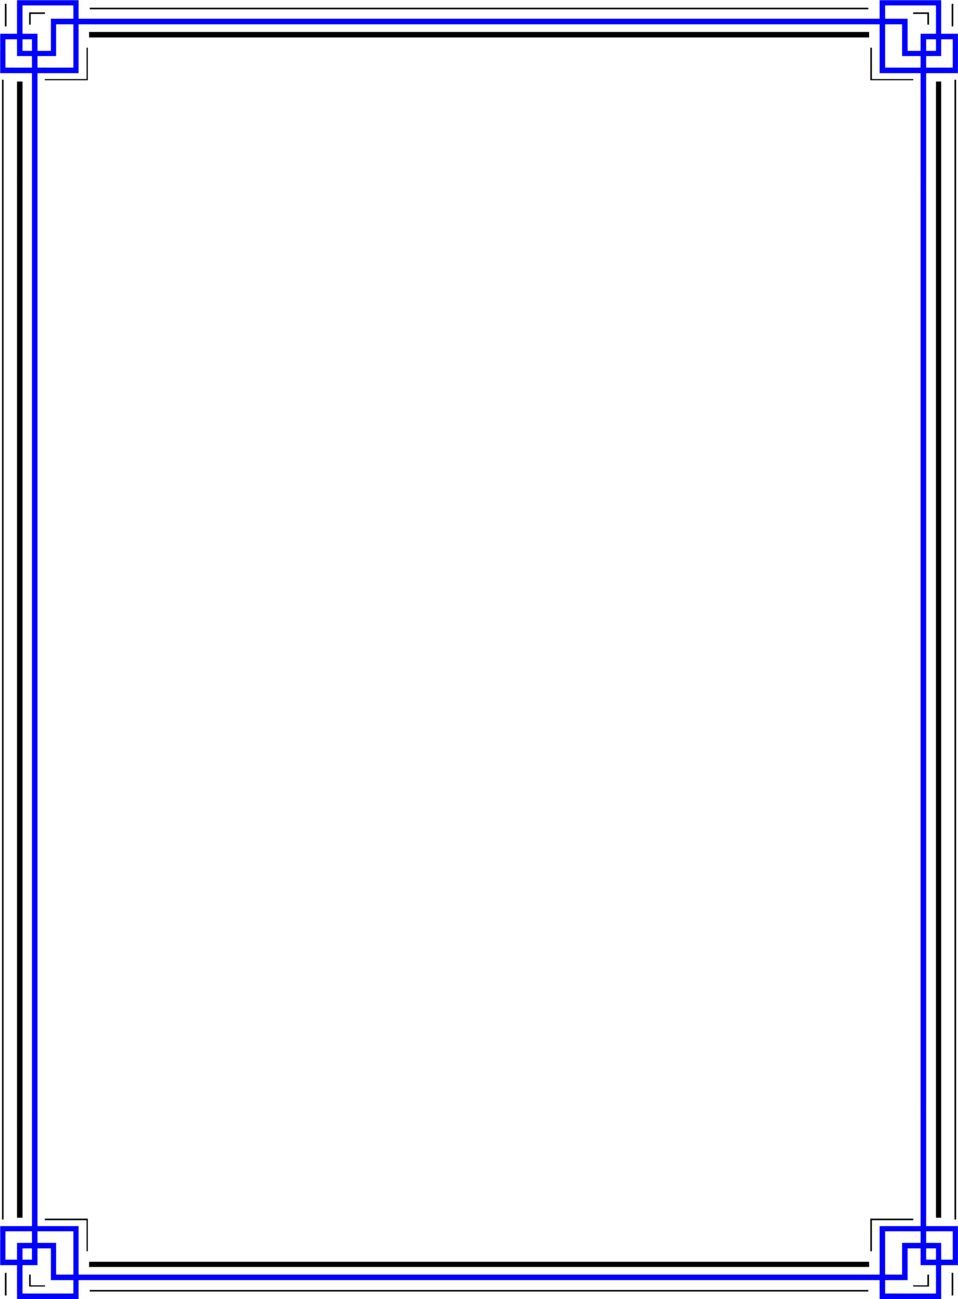 border blue